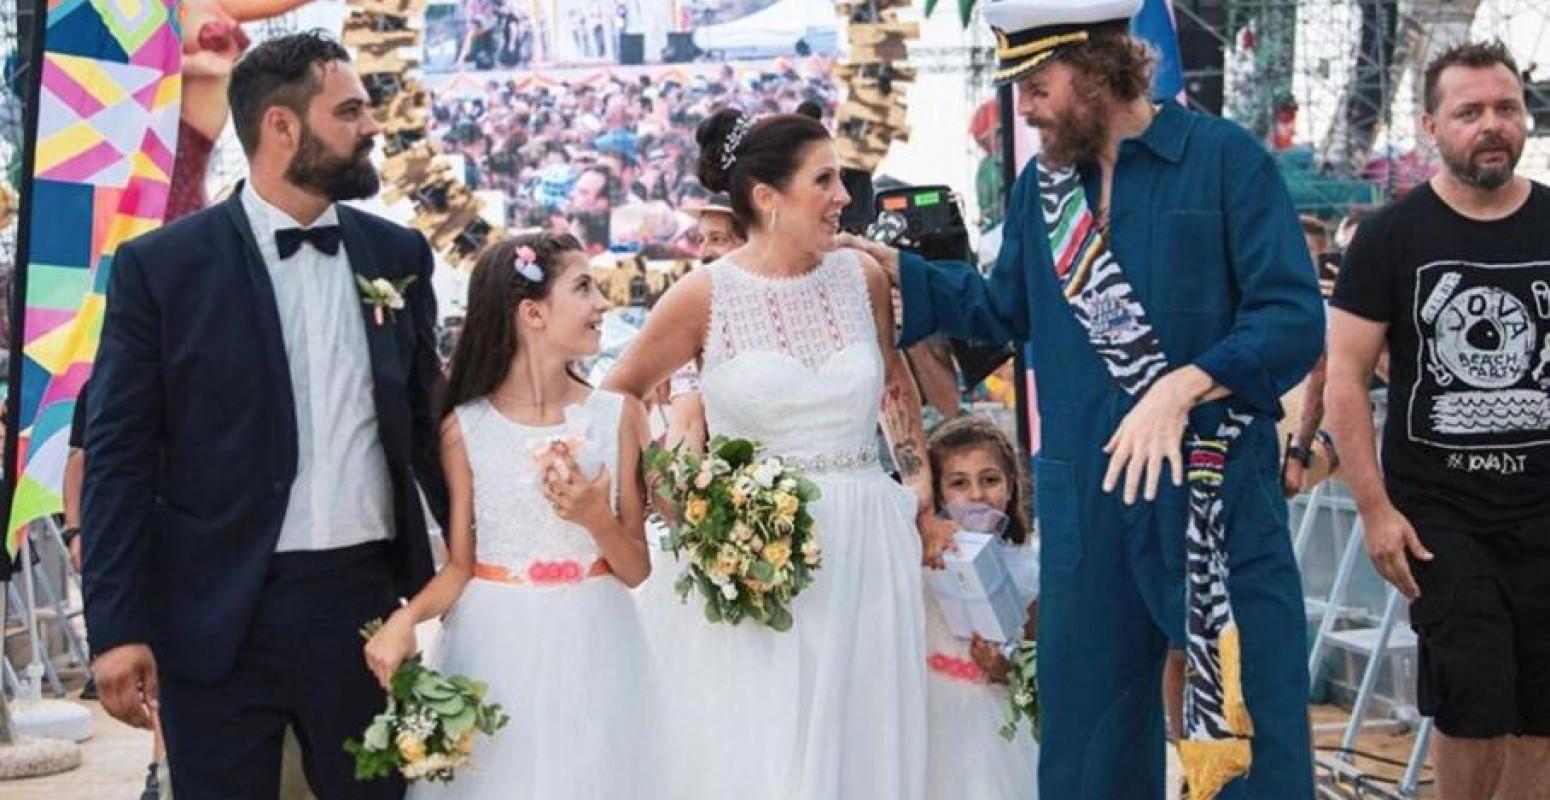 Favole Uomo - Jova Beach Wedding 07/07/2019